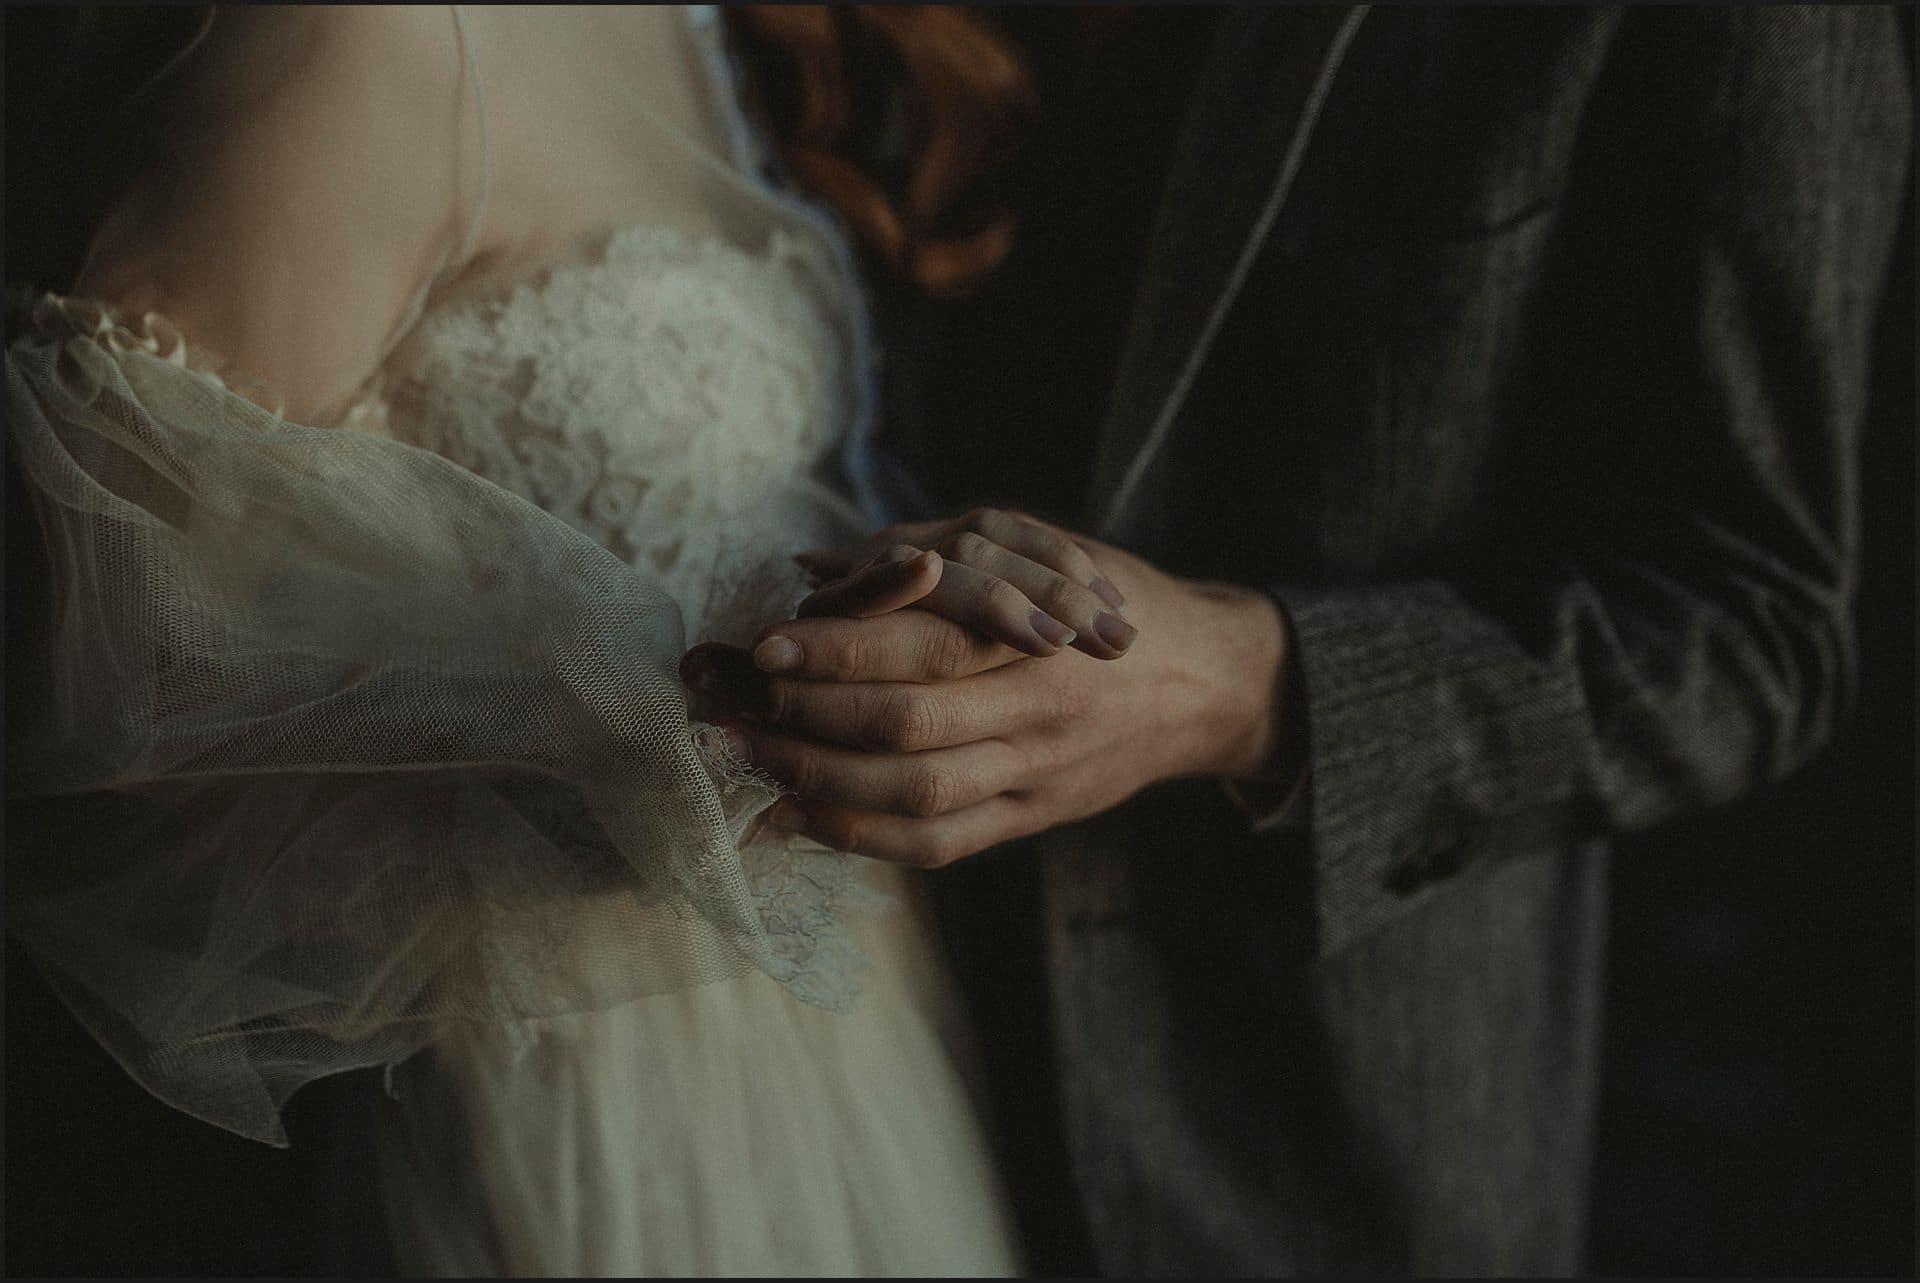 holding hands, bride and groom, wedding gown, unconventional wedding, cross studio, milan, wedding photographer, wedding in italy